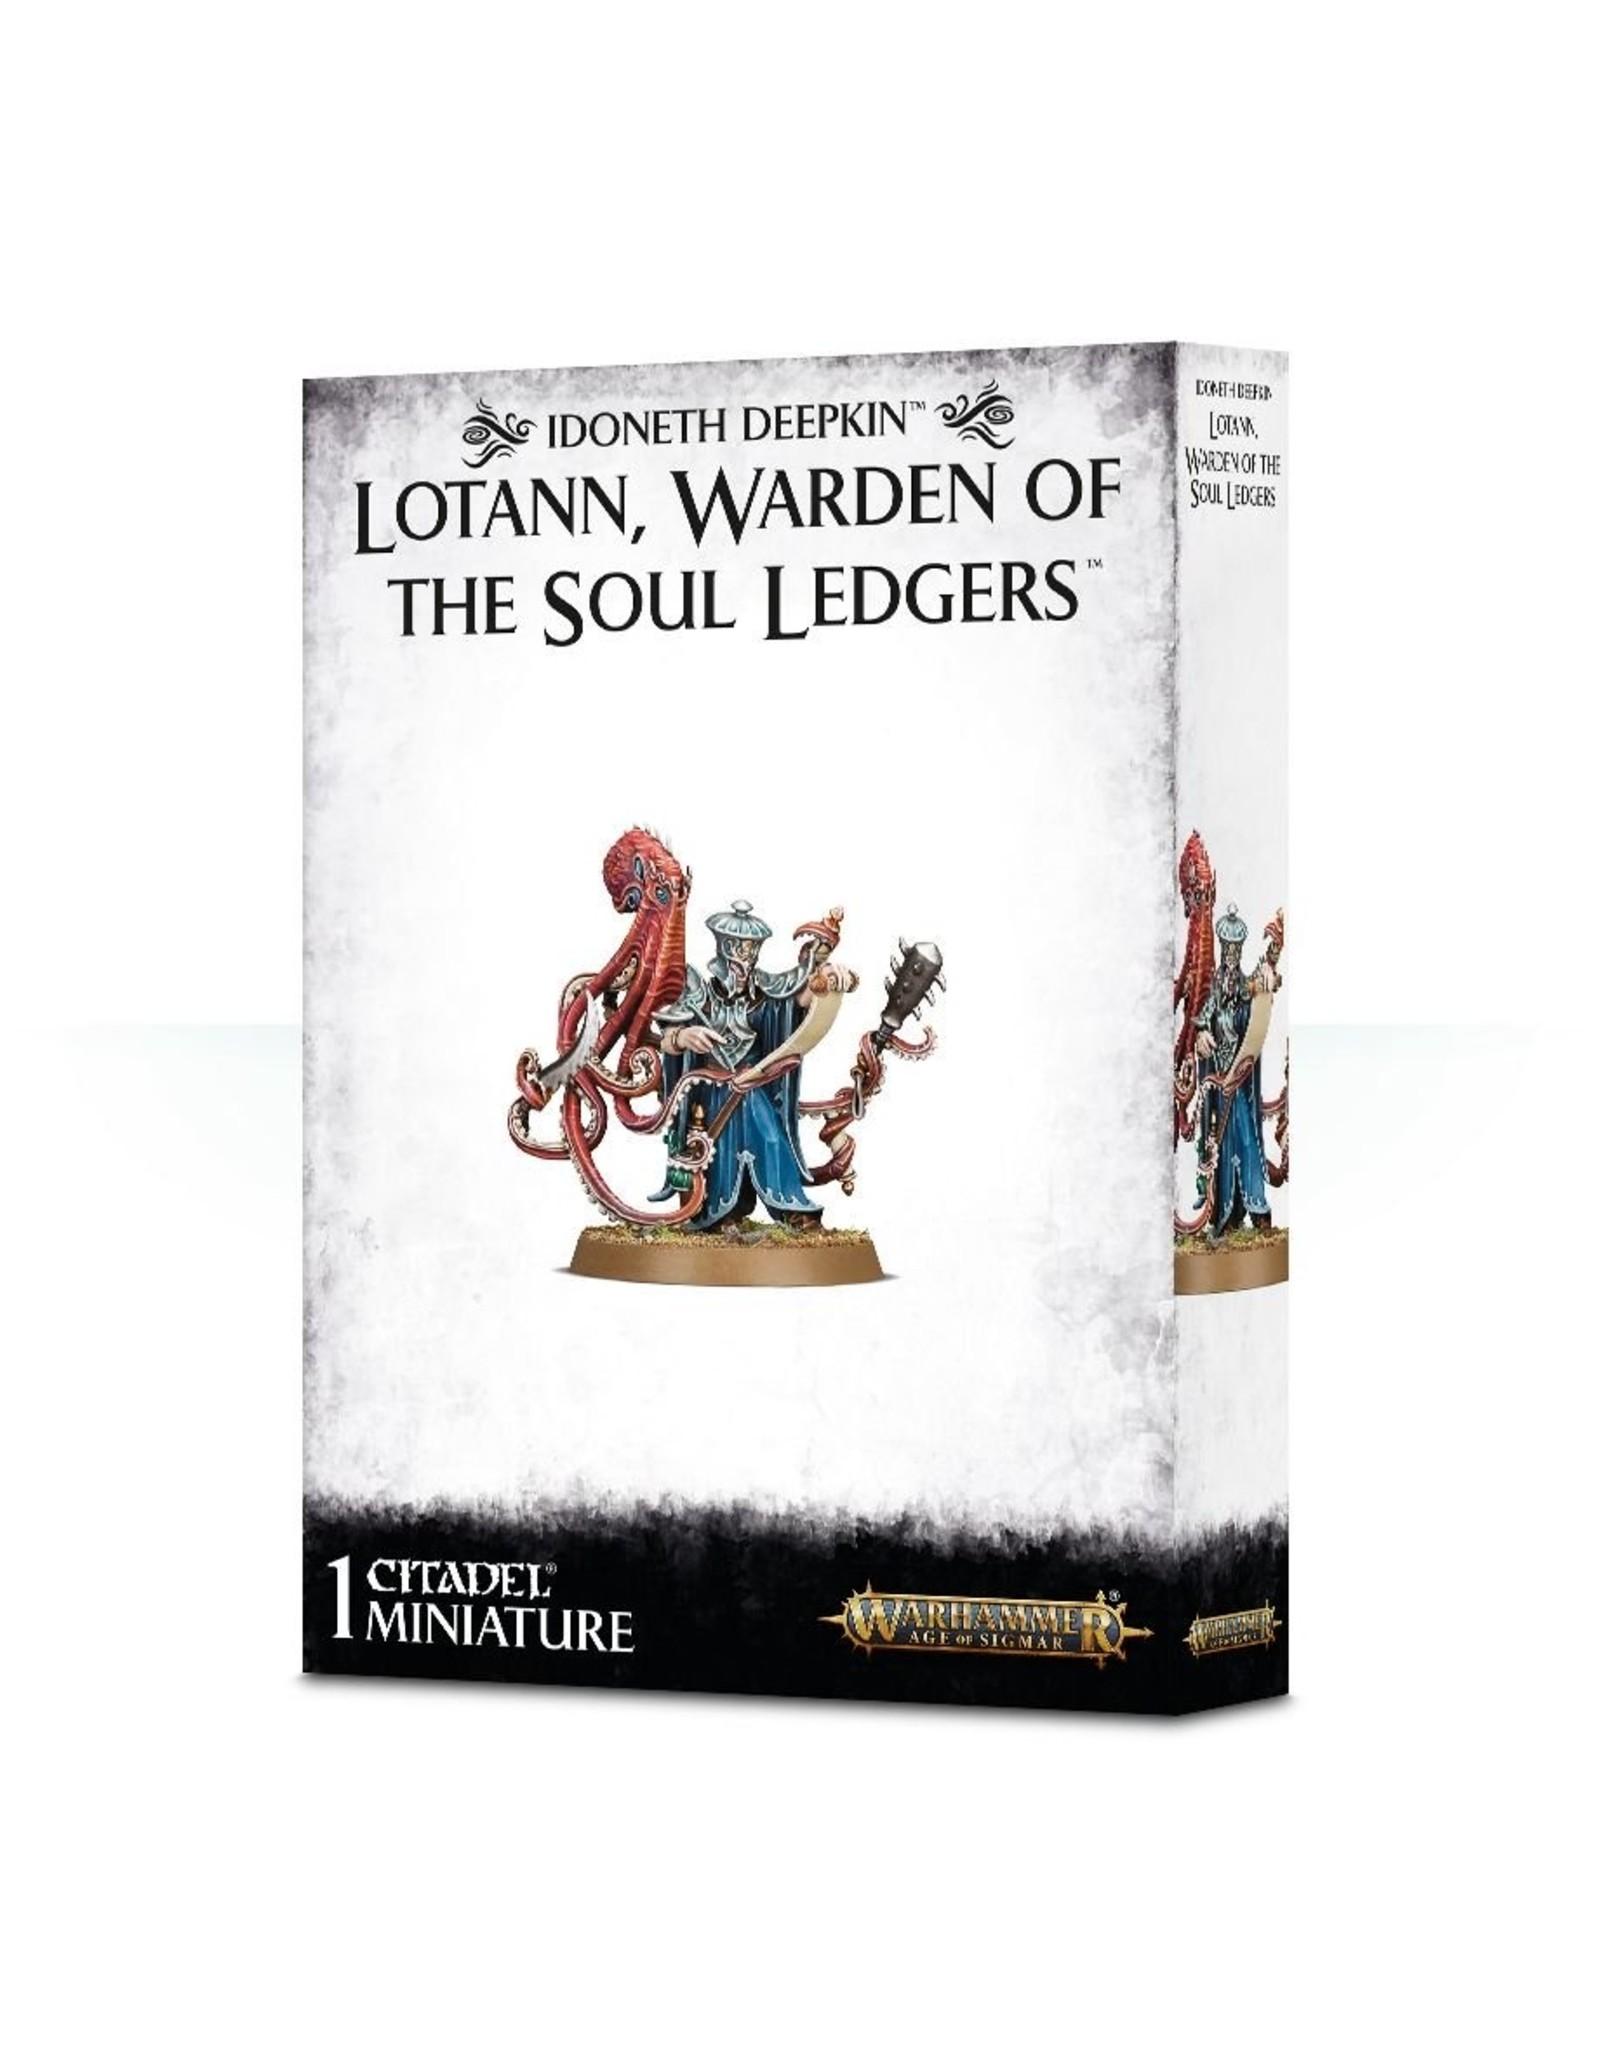 Warhammer Age of Sigmar: Order Idoneth Deepkin Lotann Warden of the Soul Ledgers